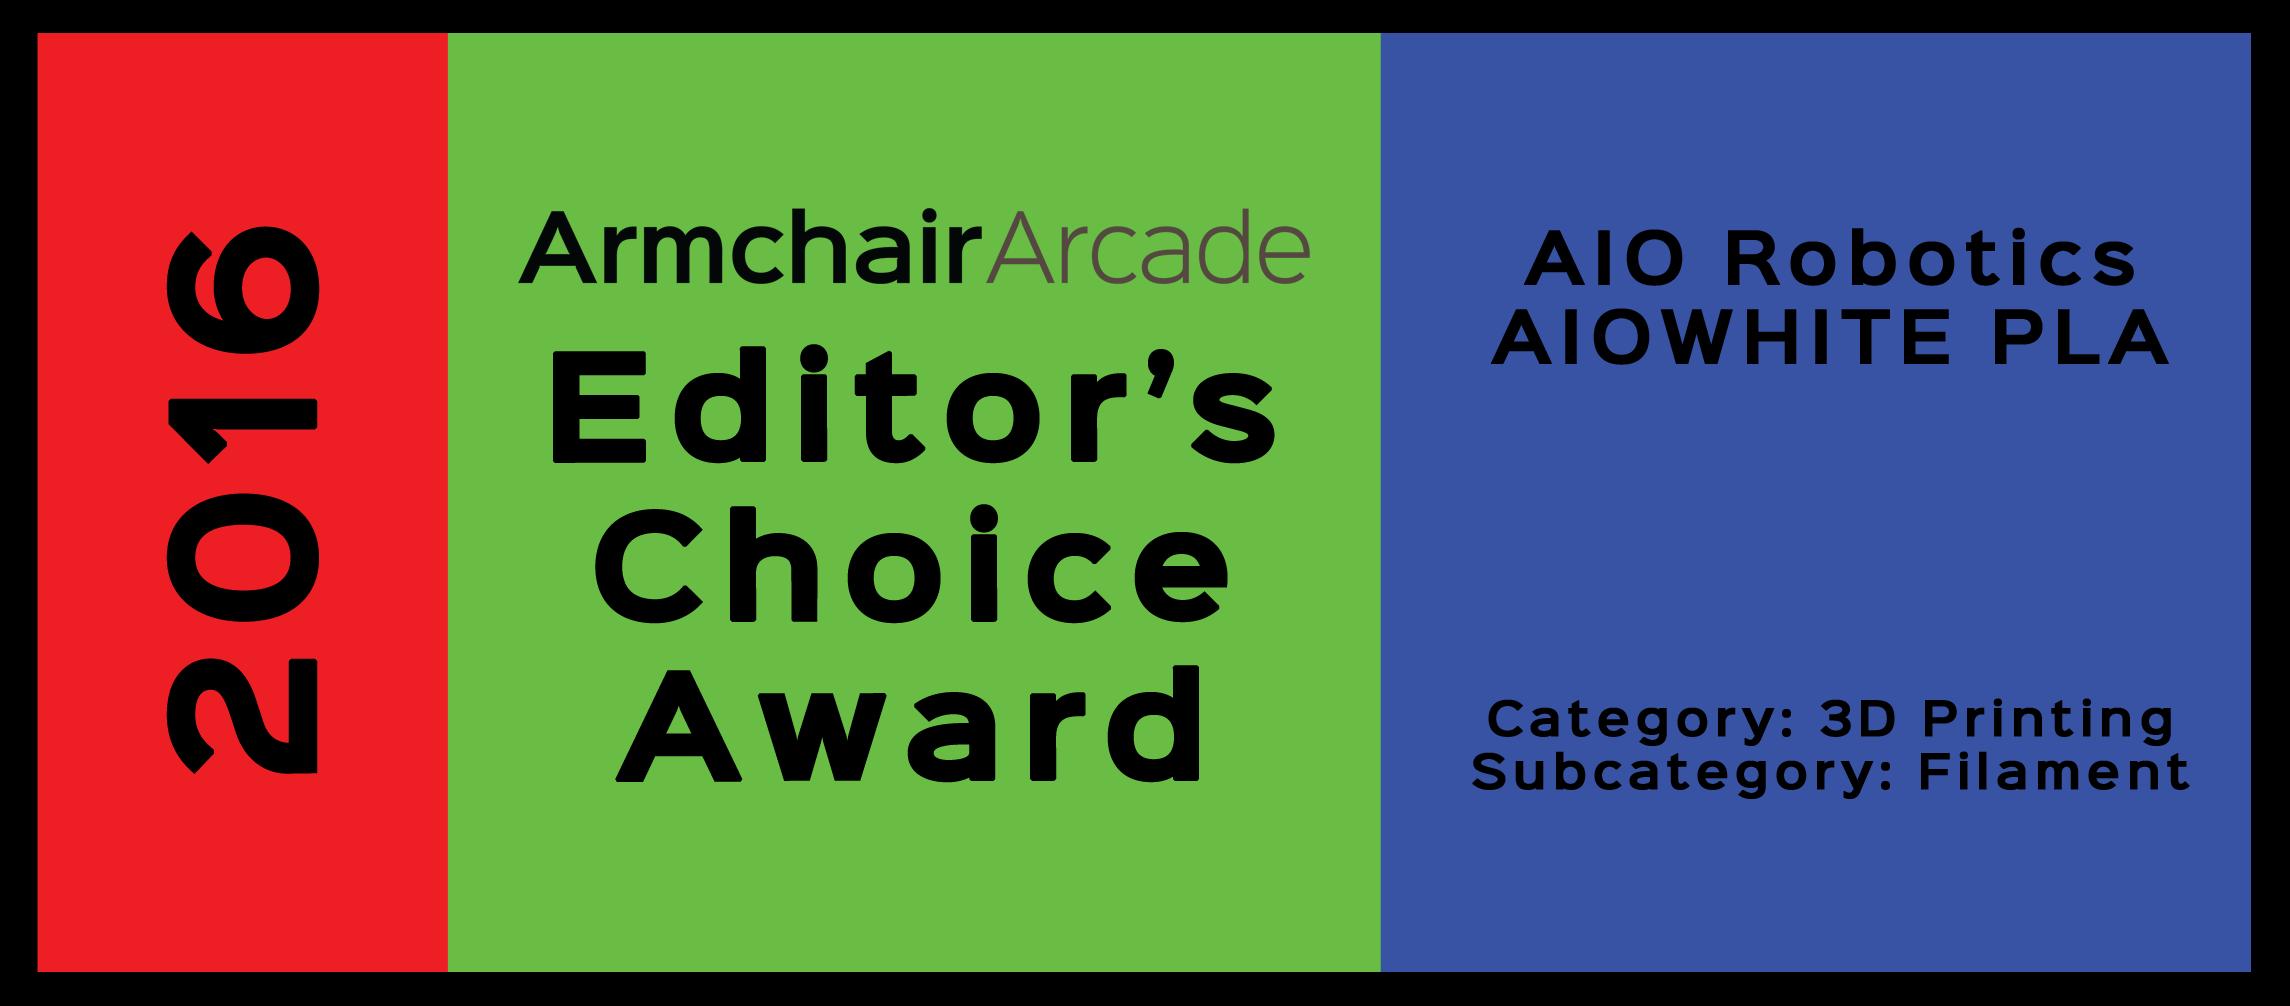 Armchair Arcade Editor's Choice Award 2016: AIO Robotics AIOWHITE PLA 3D Printer Filament